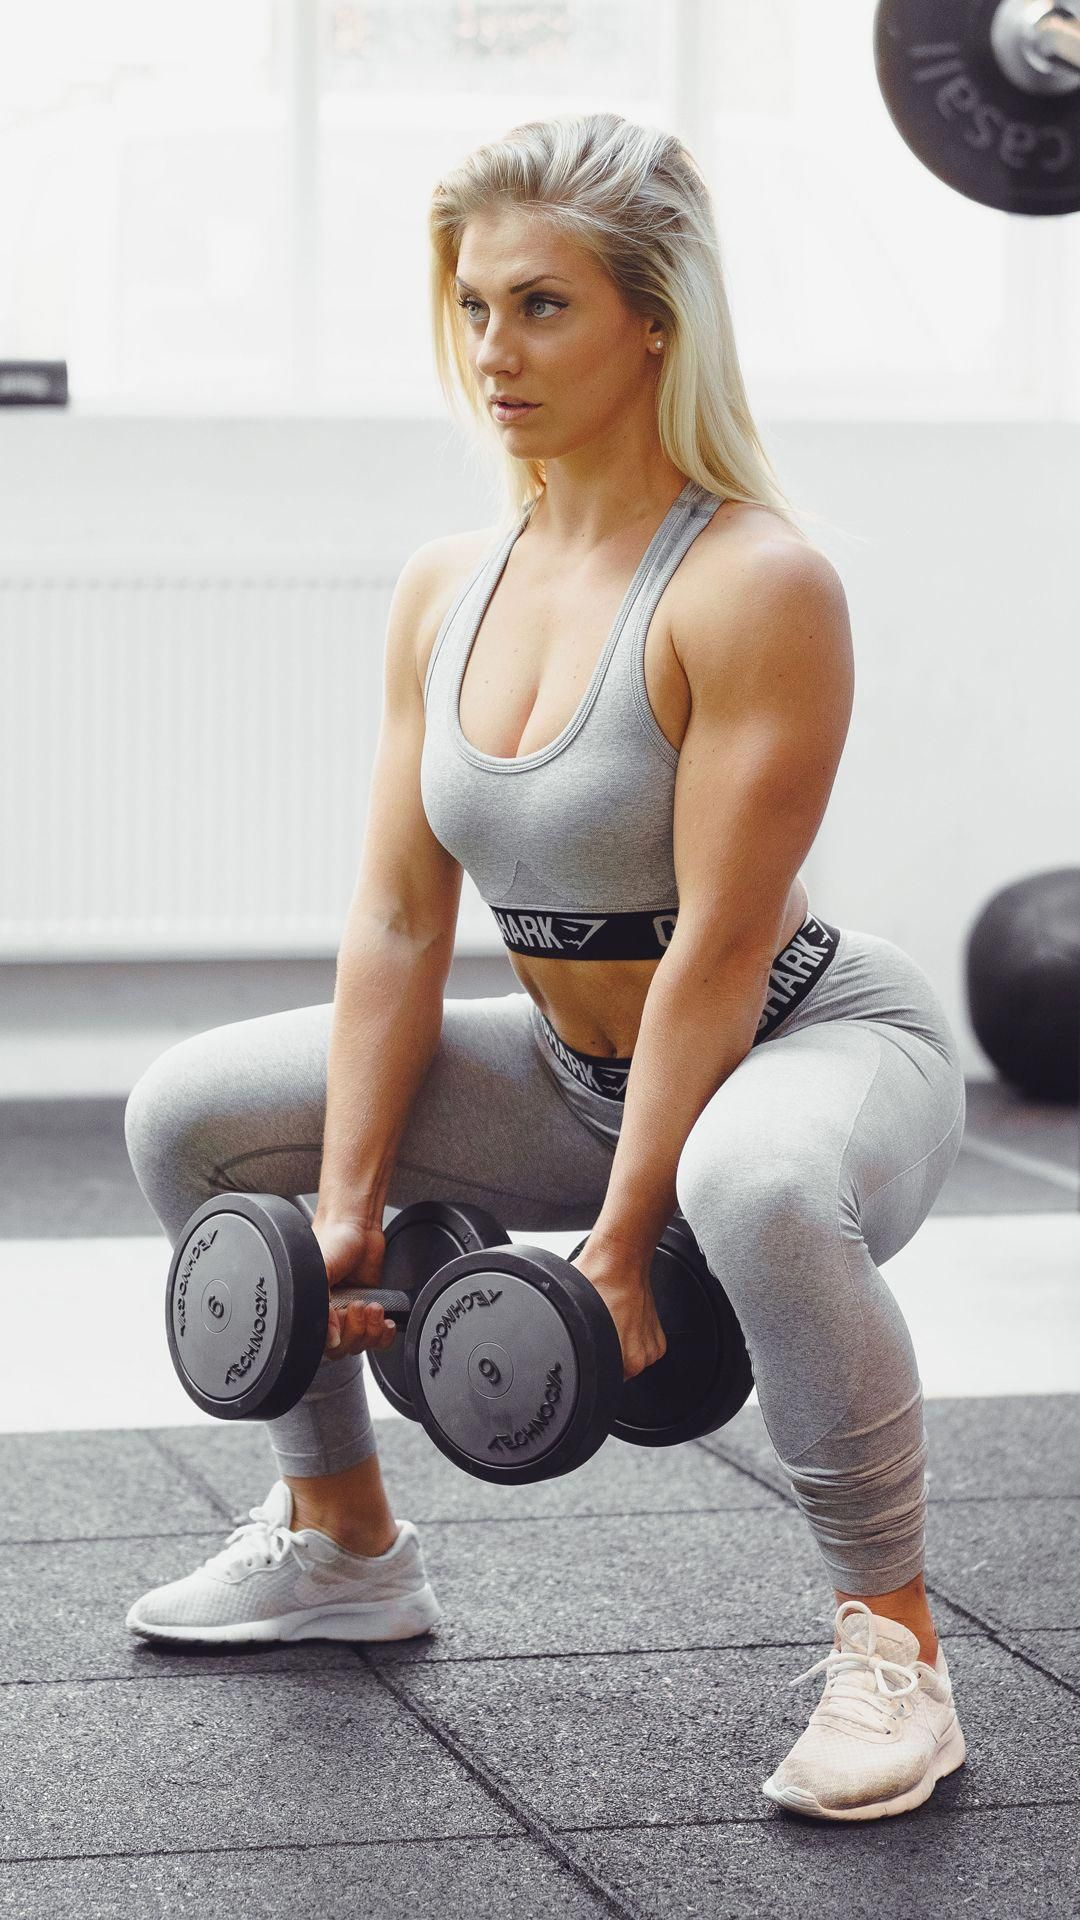 Squat Goals Form Flattering And Figure Hugging The Women